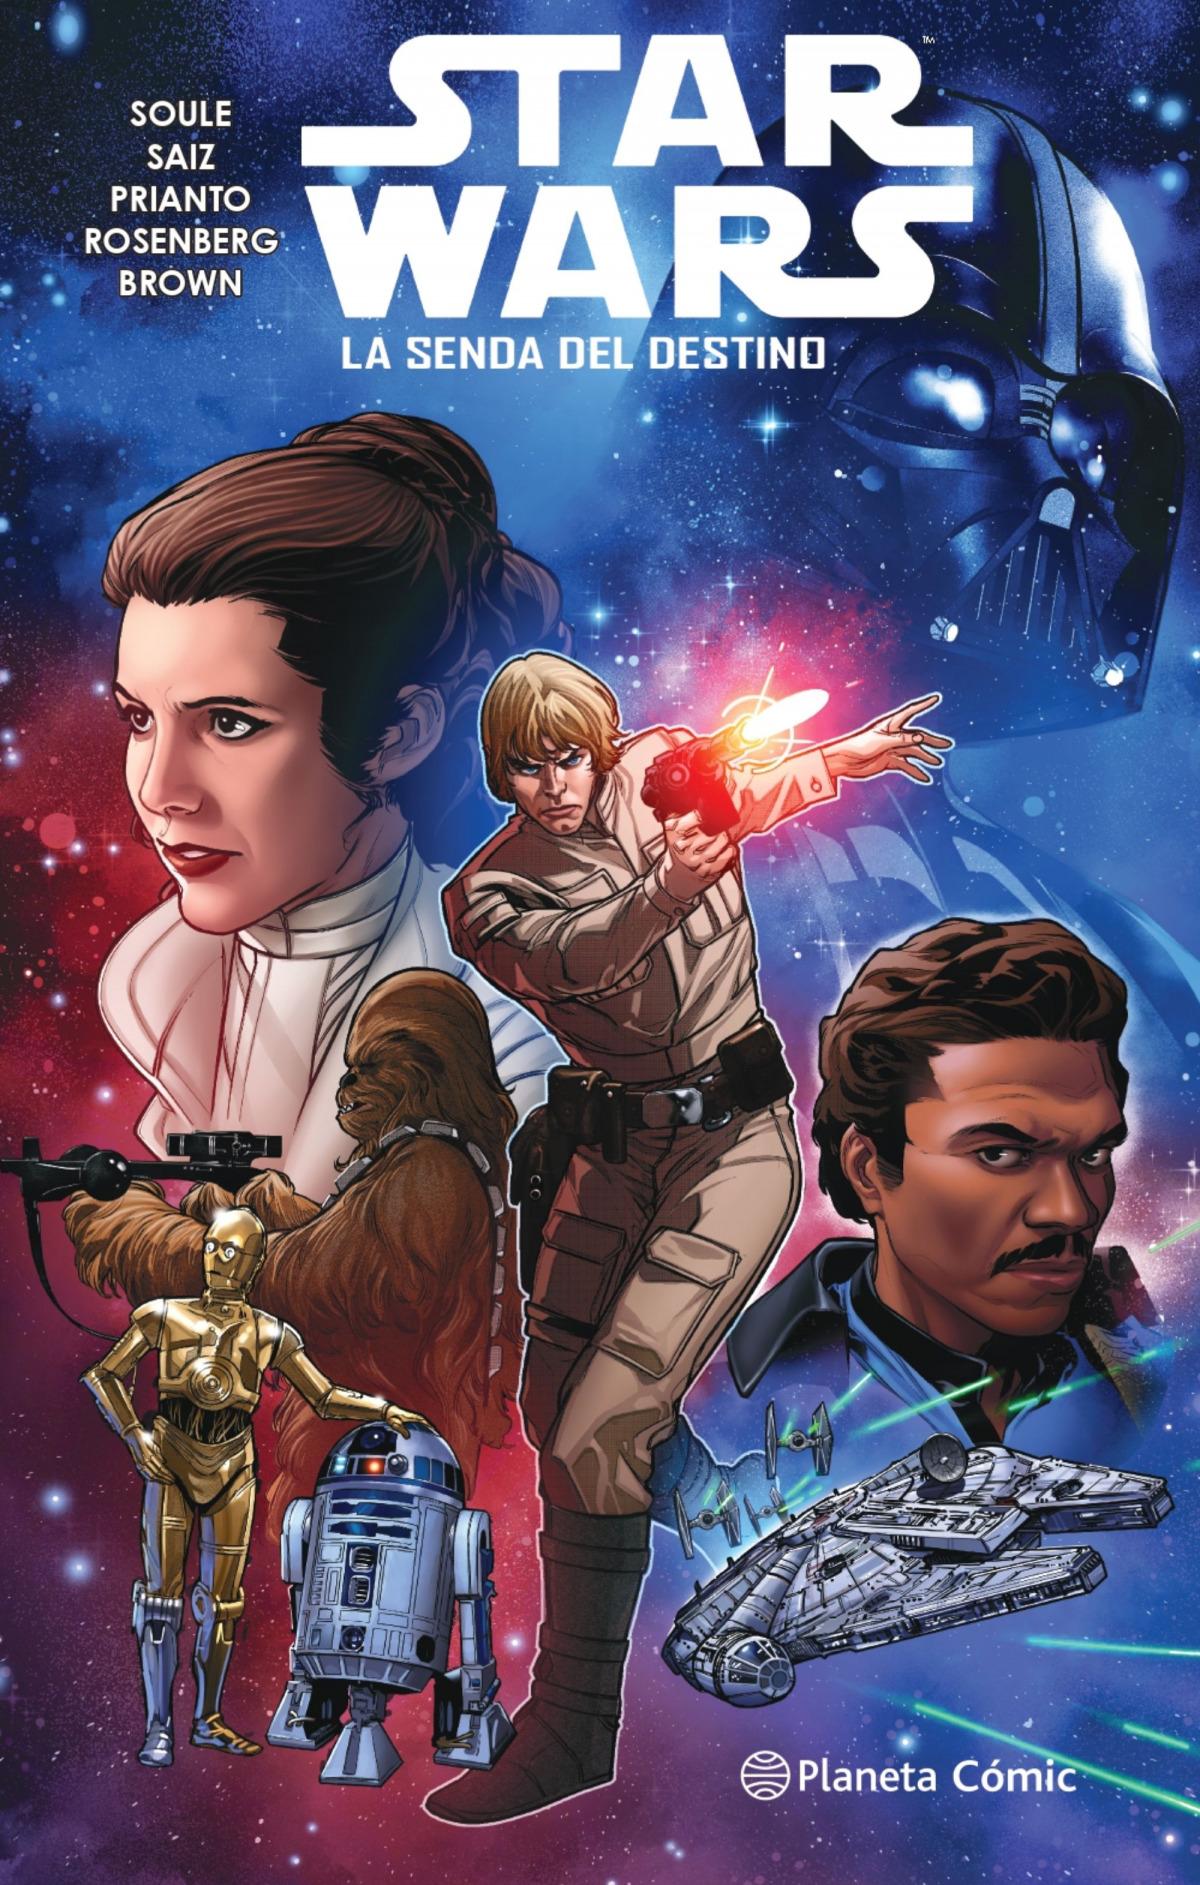 Star Wars nº 01 Destiny Path (tomo)